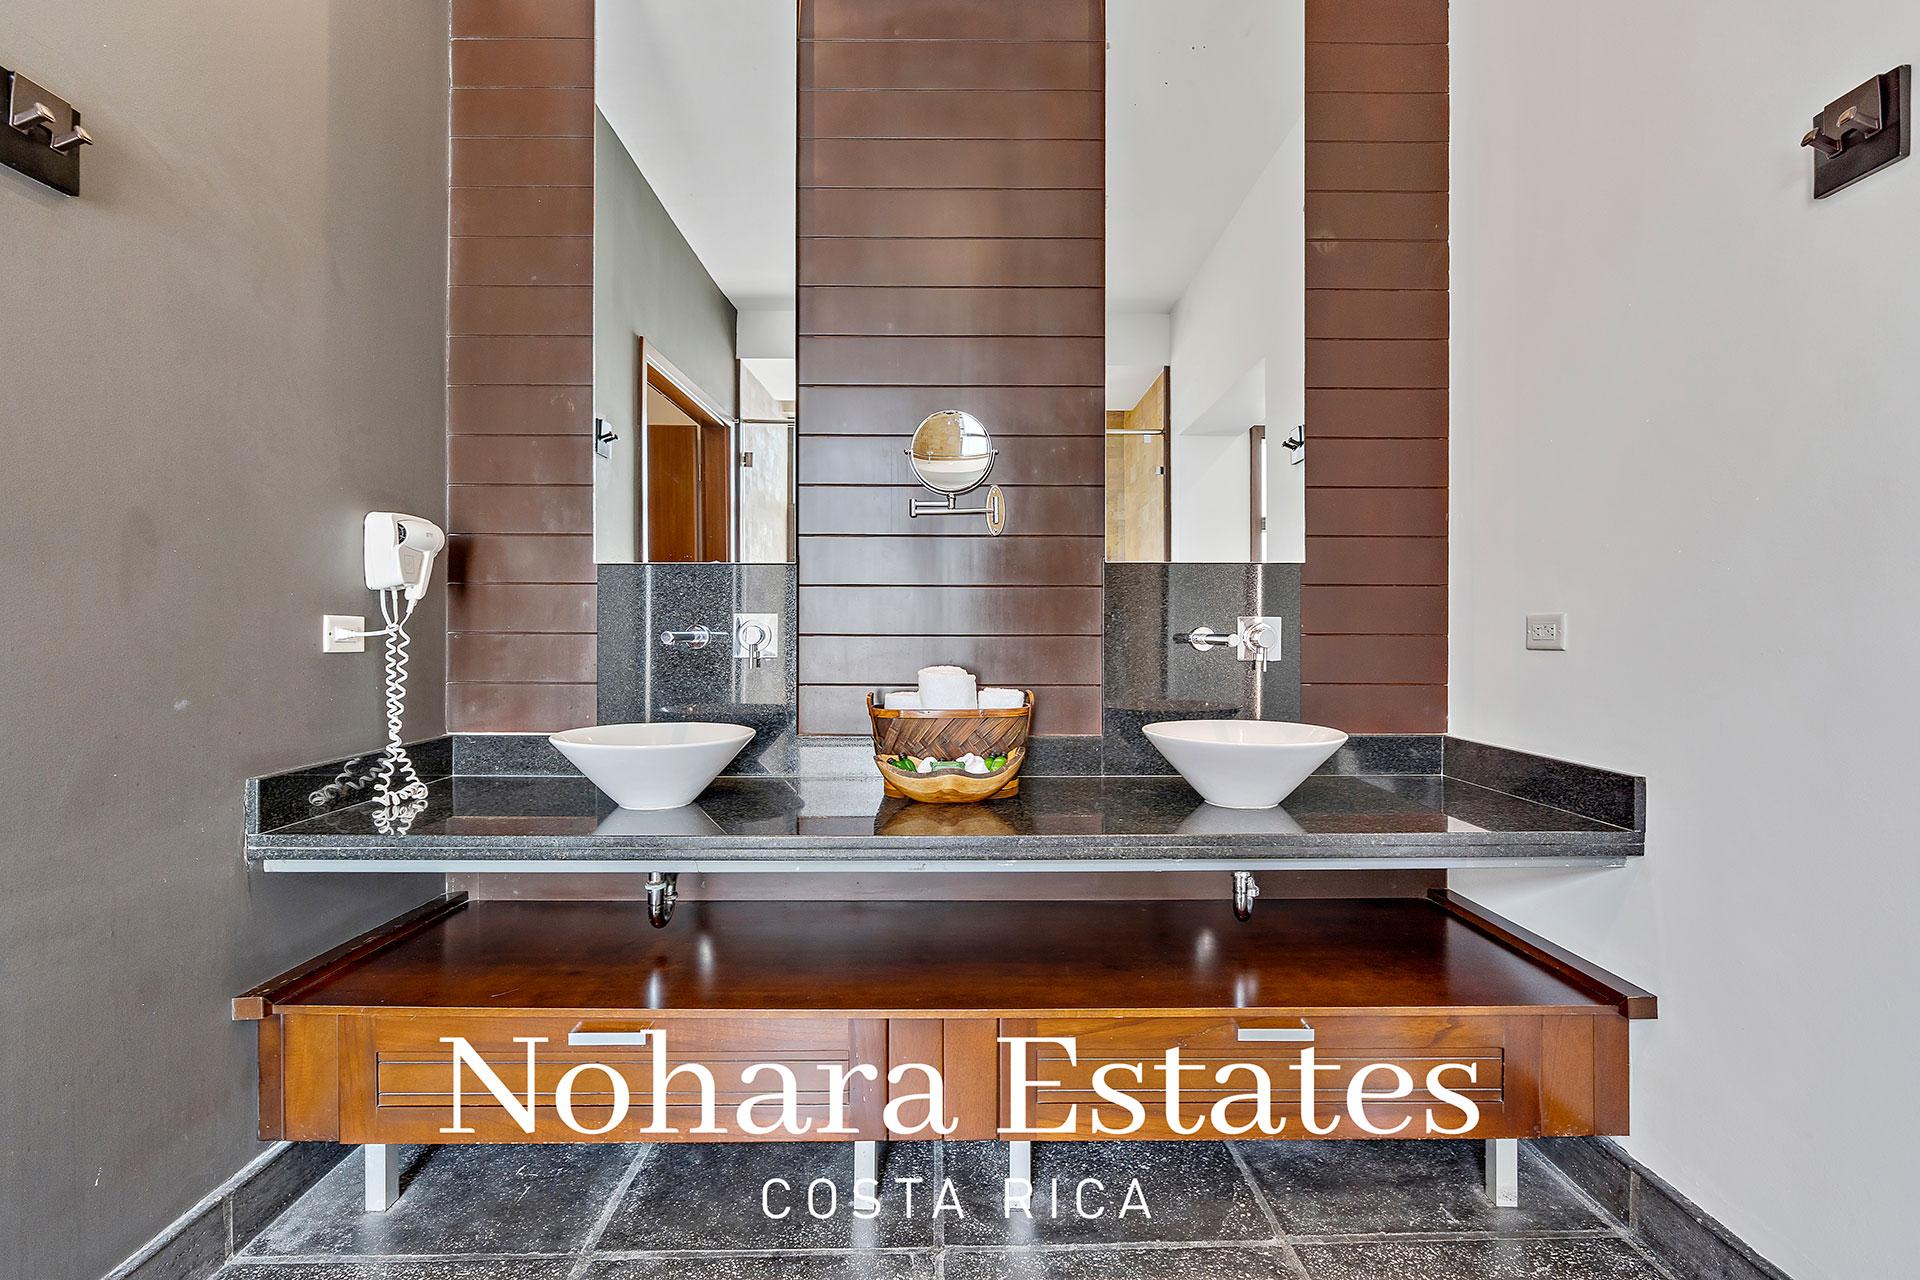 Nohara Estates Costa Rica 122 Apartment Quepos Los Altos 11